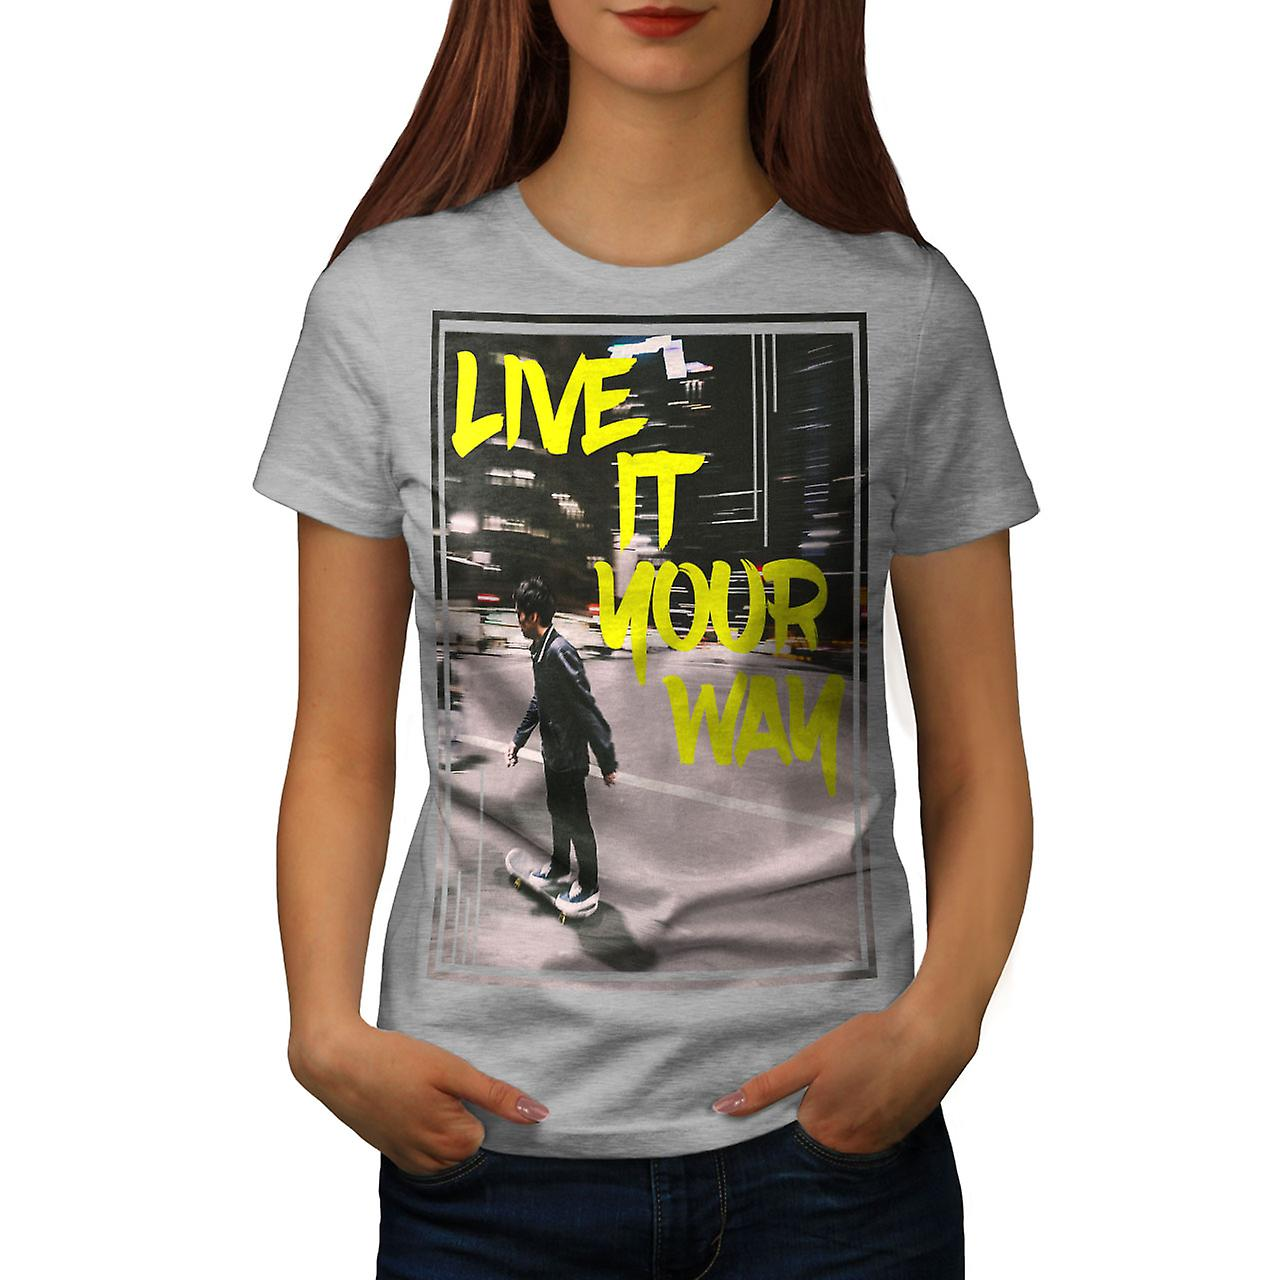 Vivre la ville Street Fashion GreyT-chemise femme | Wellcoda